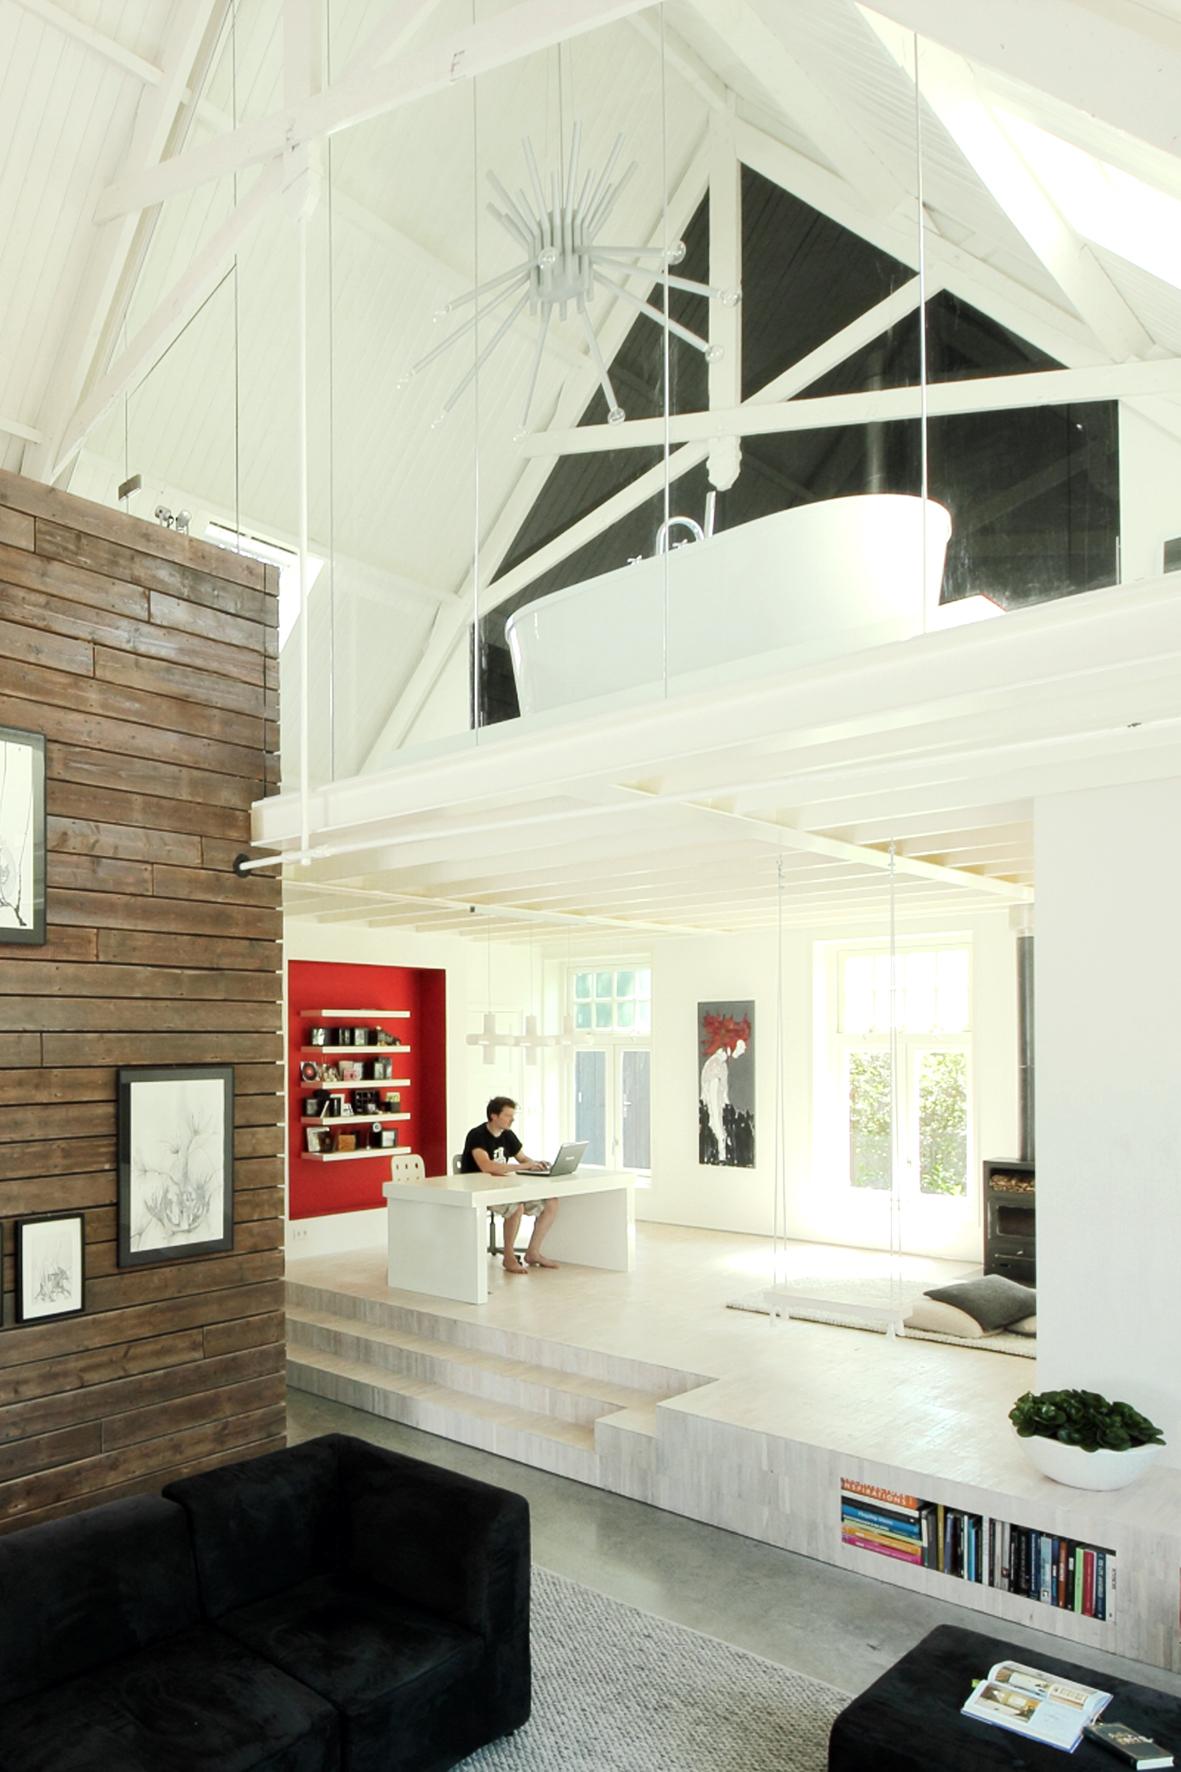 22 ideas home decorating bright (13)